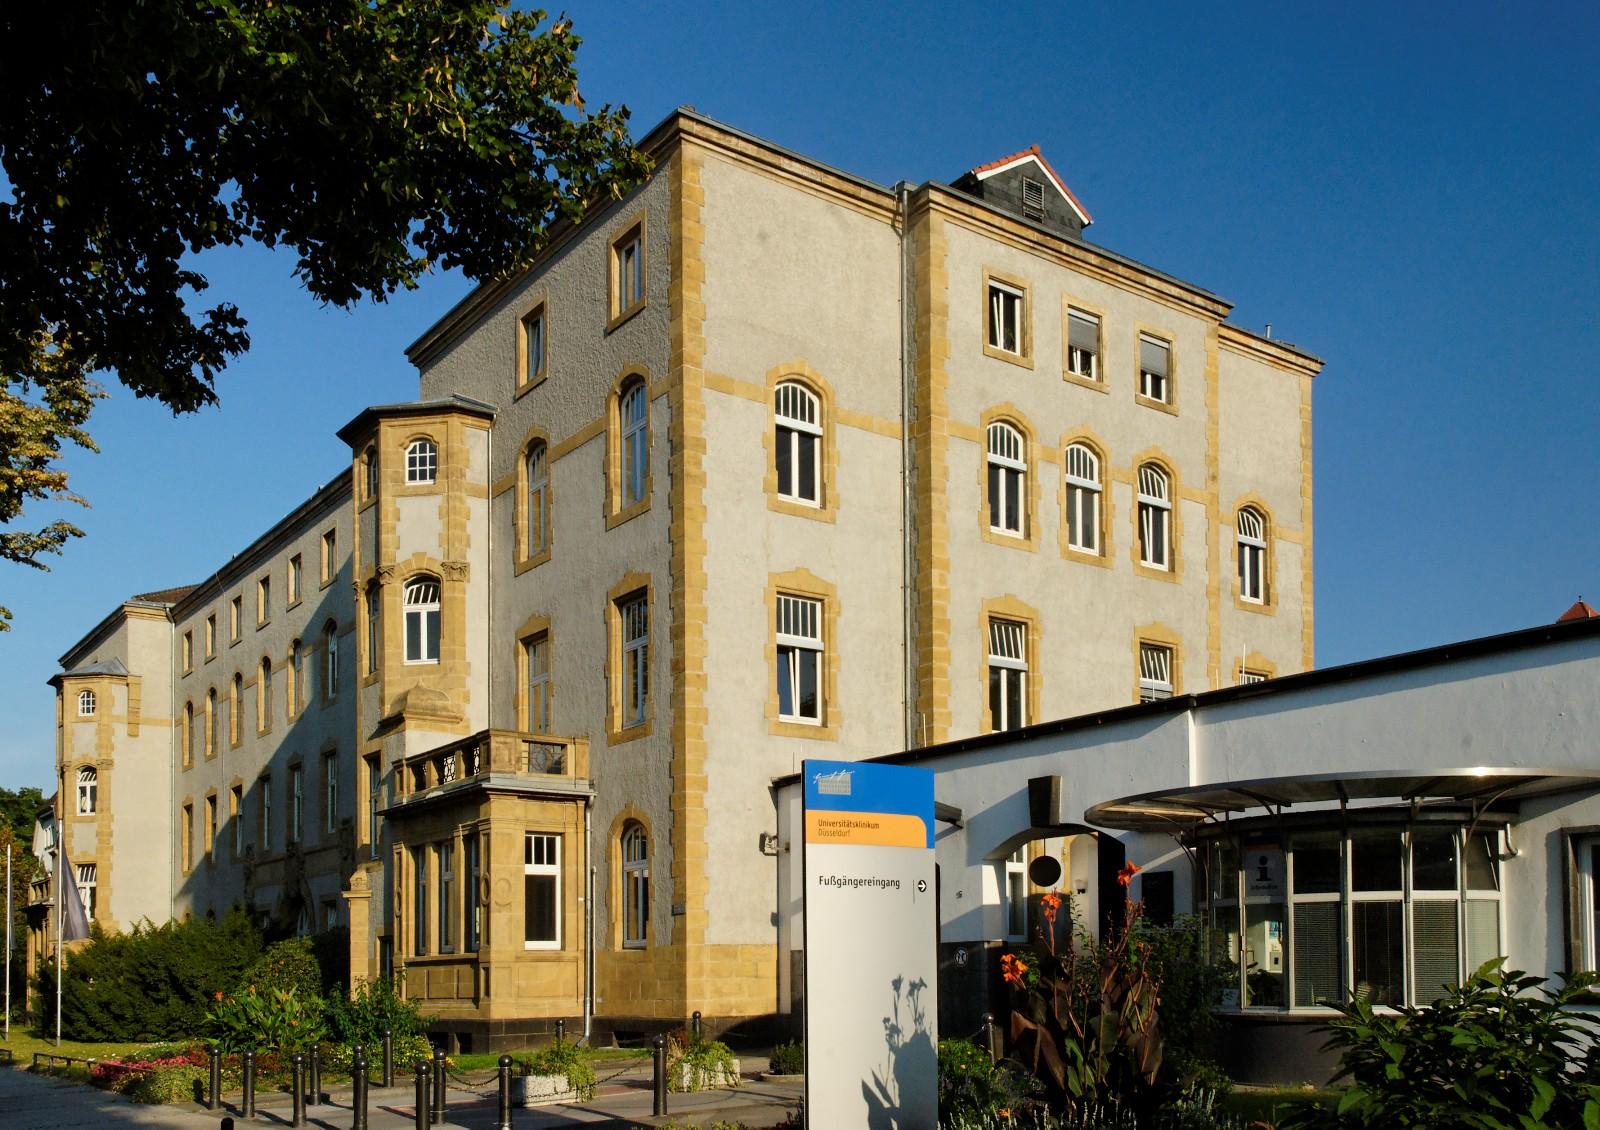 University Hospital of Düsseldorf - Wikipedia